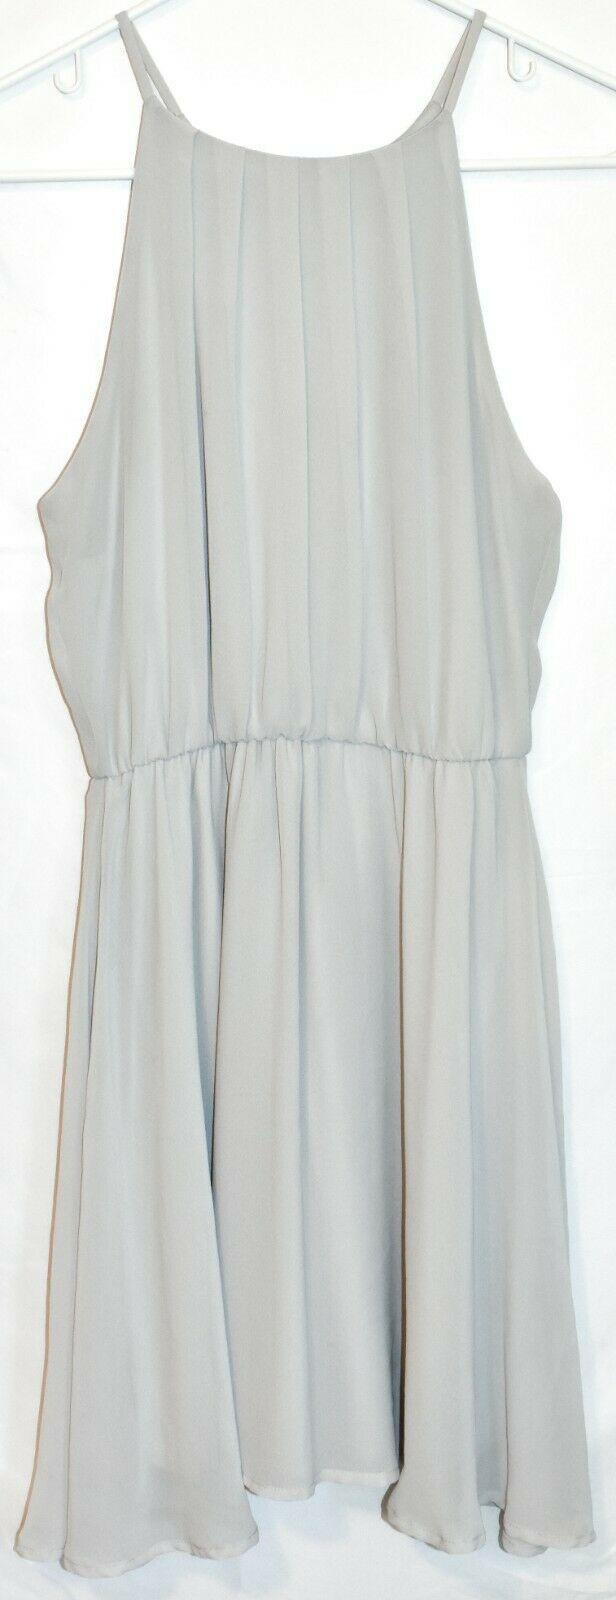 Lush Women's Light Gray High Neck Sleeveless Blouson Chiffon Skater Dress Size S